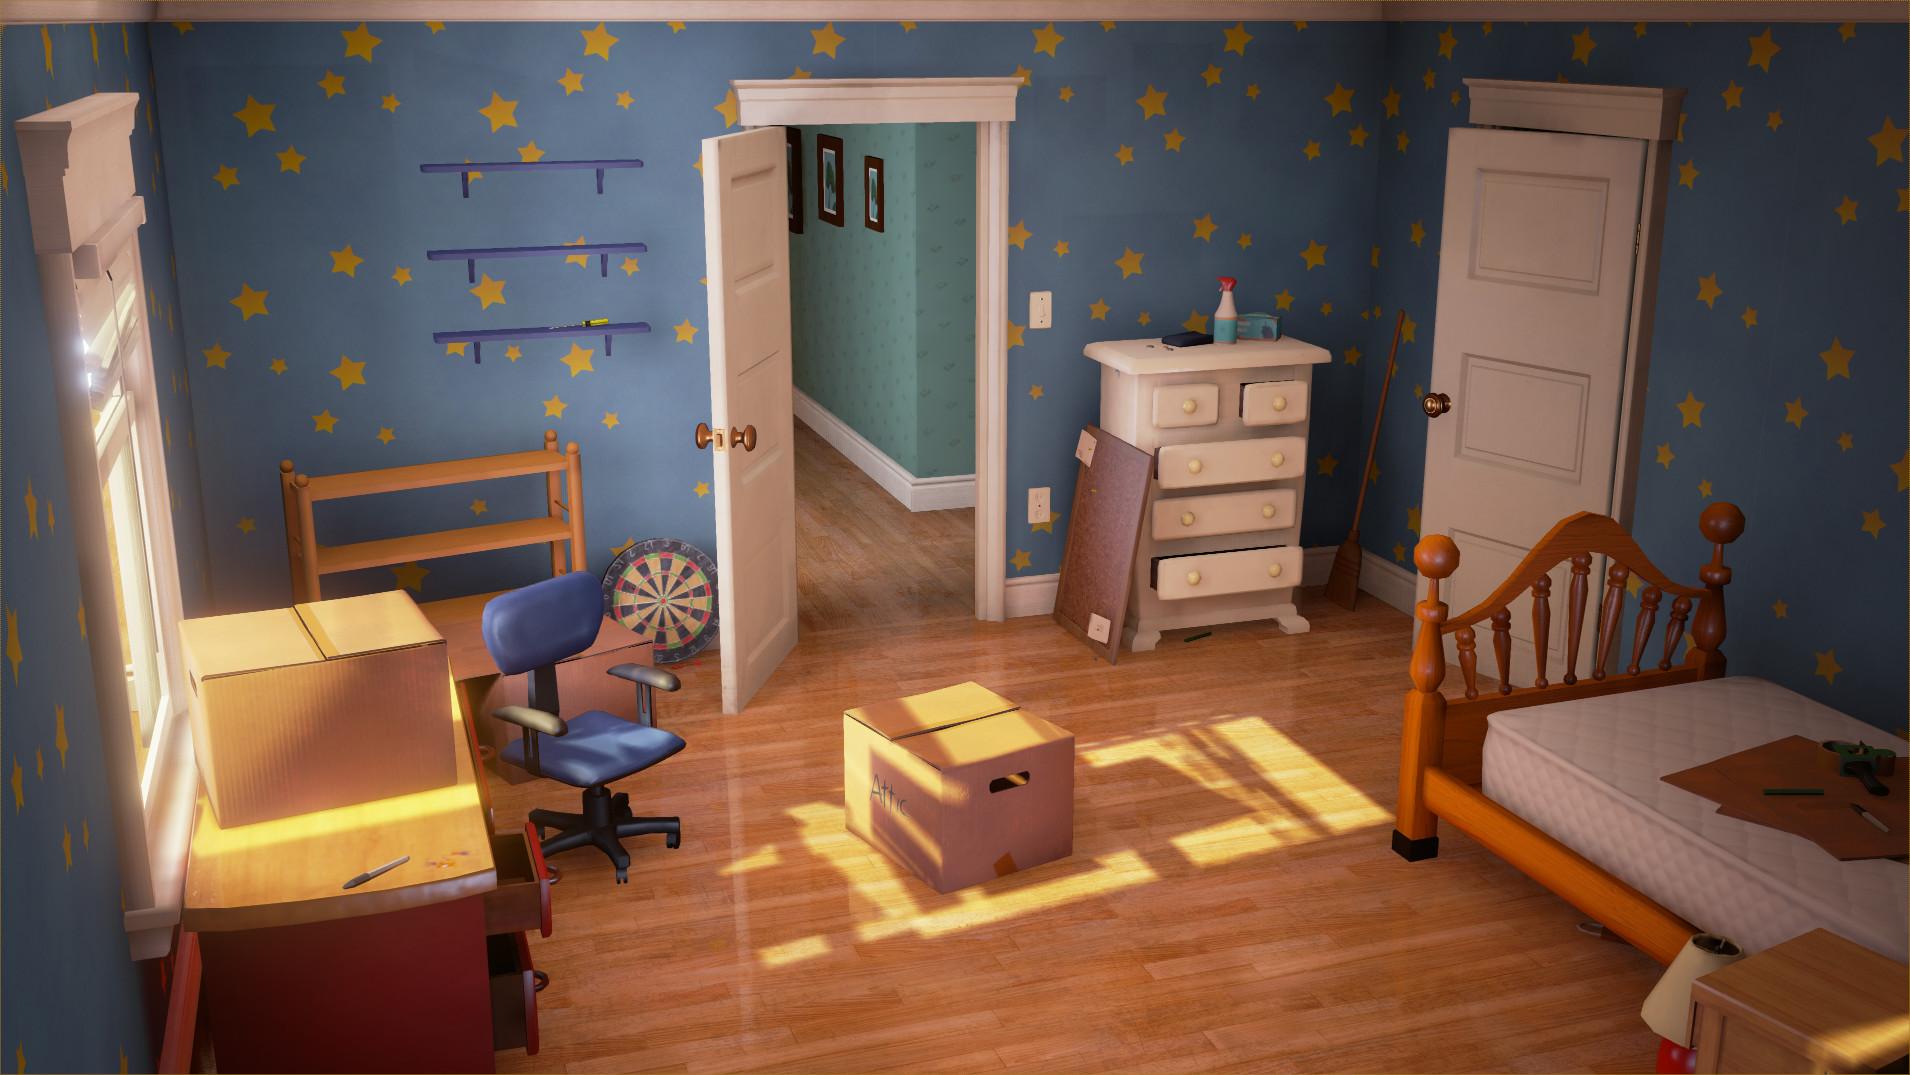 Artstation Andy S Room Ue4 Joseph Shaw